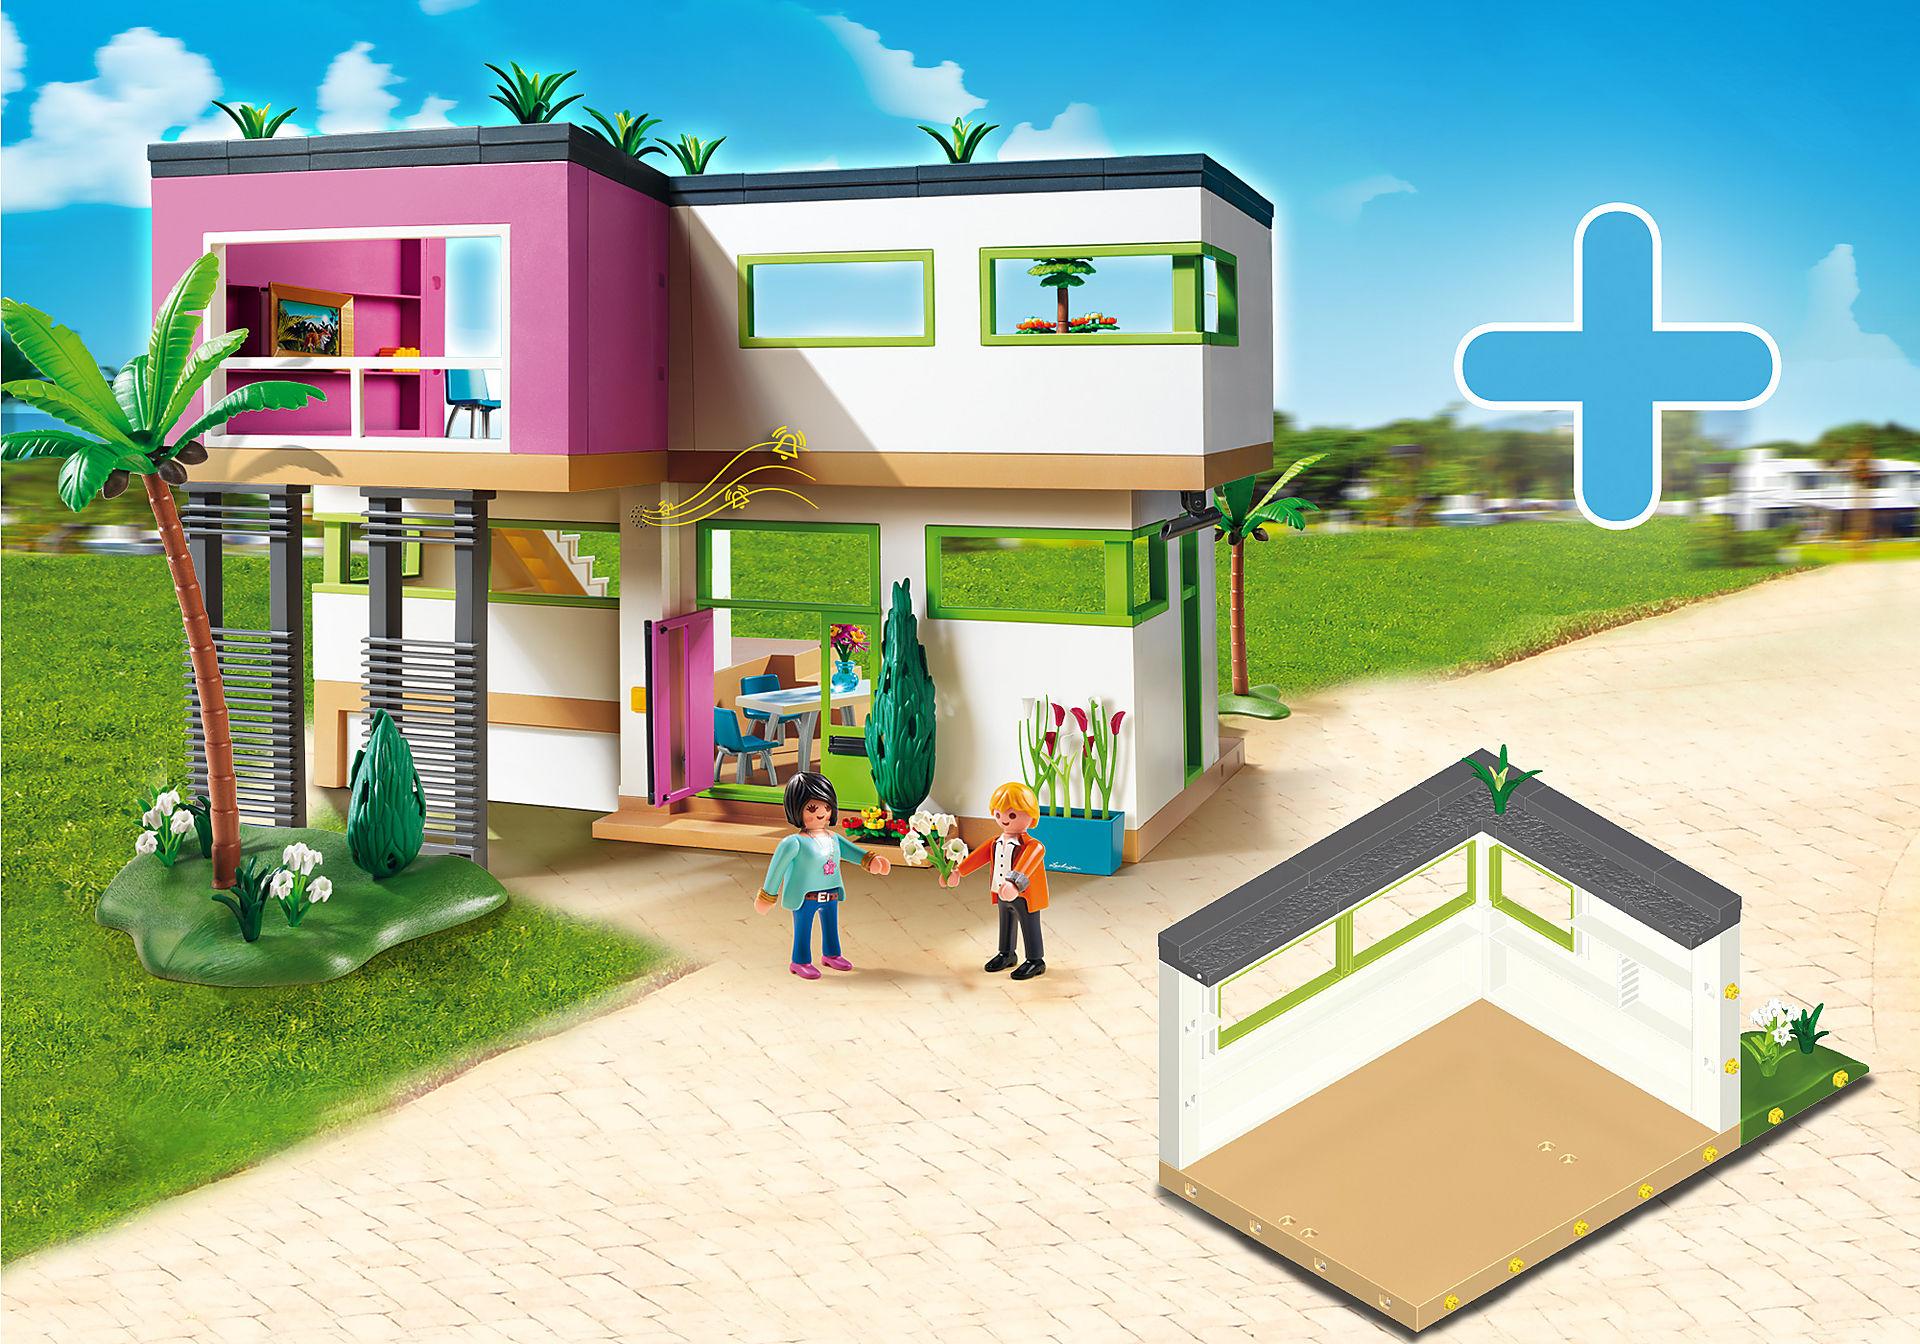 http://media.playmobil.com/i/playmobil/PM1905K_product_detail/Pakiet Nowoczesna luksusowa willa